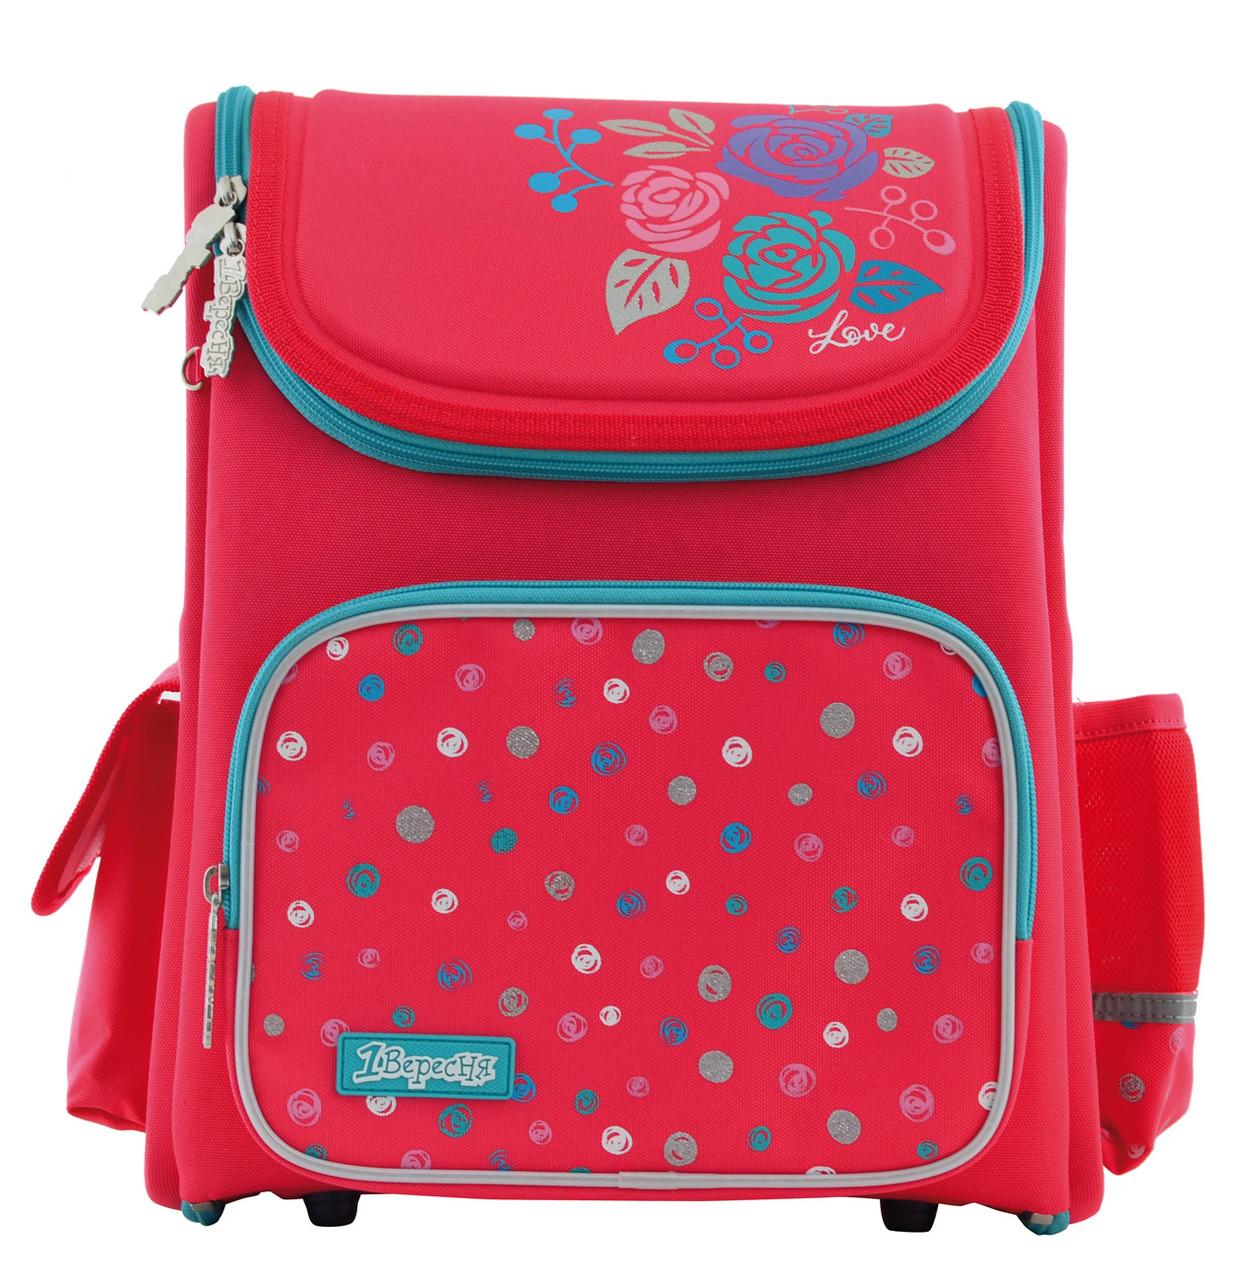 556331 Модный каркасный рюкзак 1 Вересня H-17 Lovely roses 34*28*13